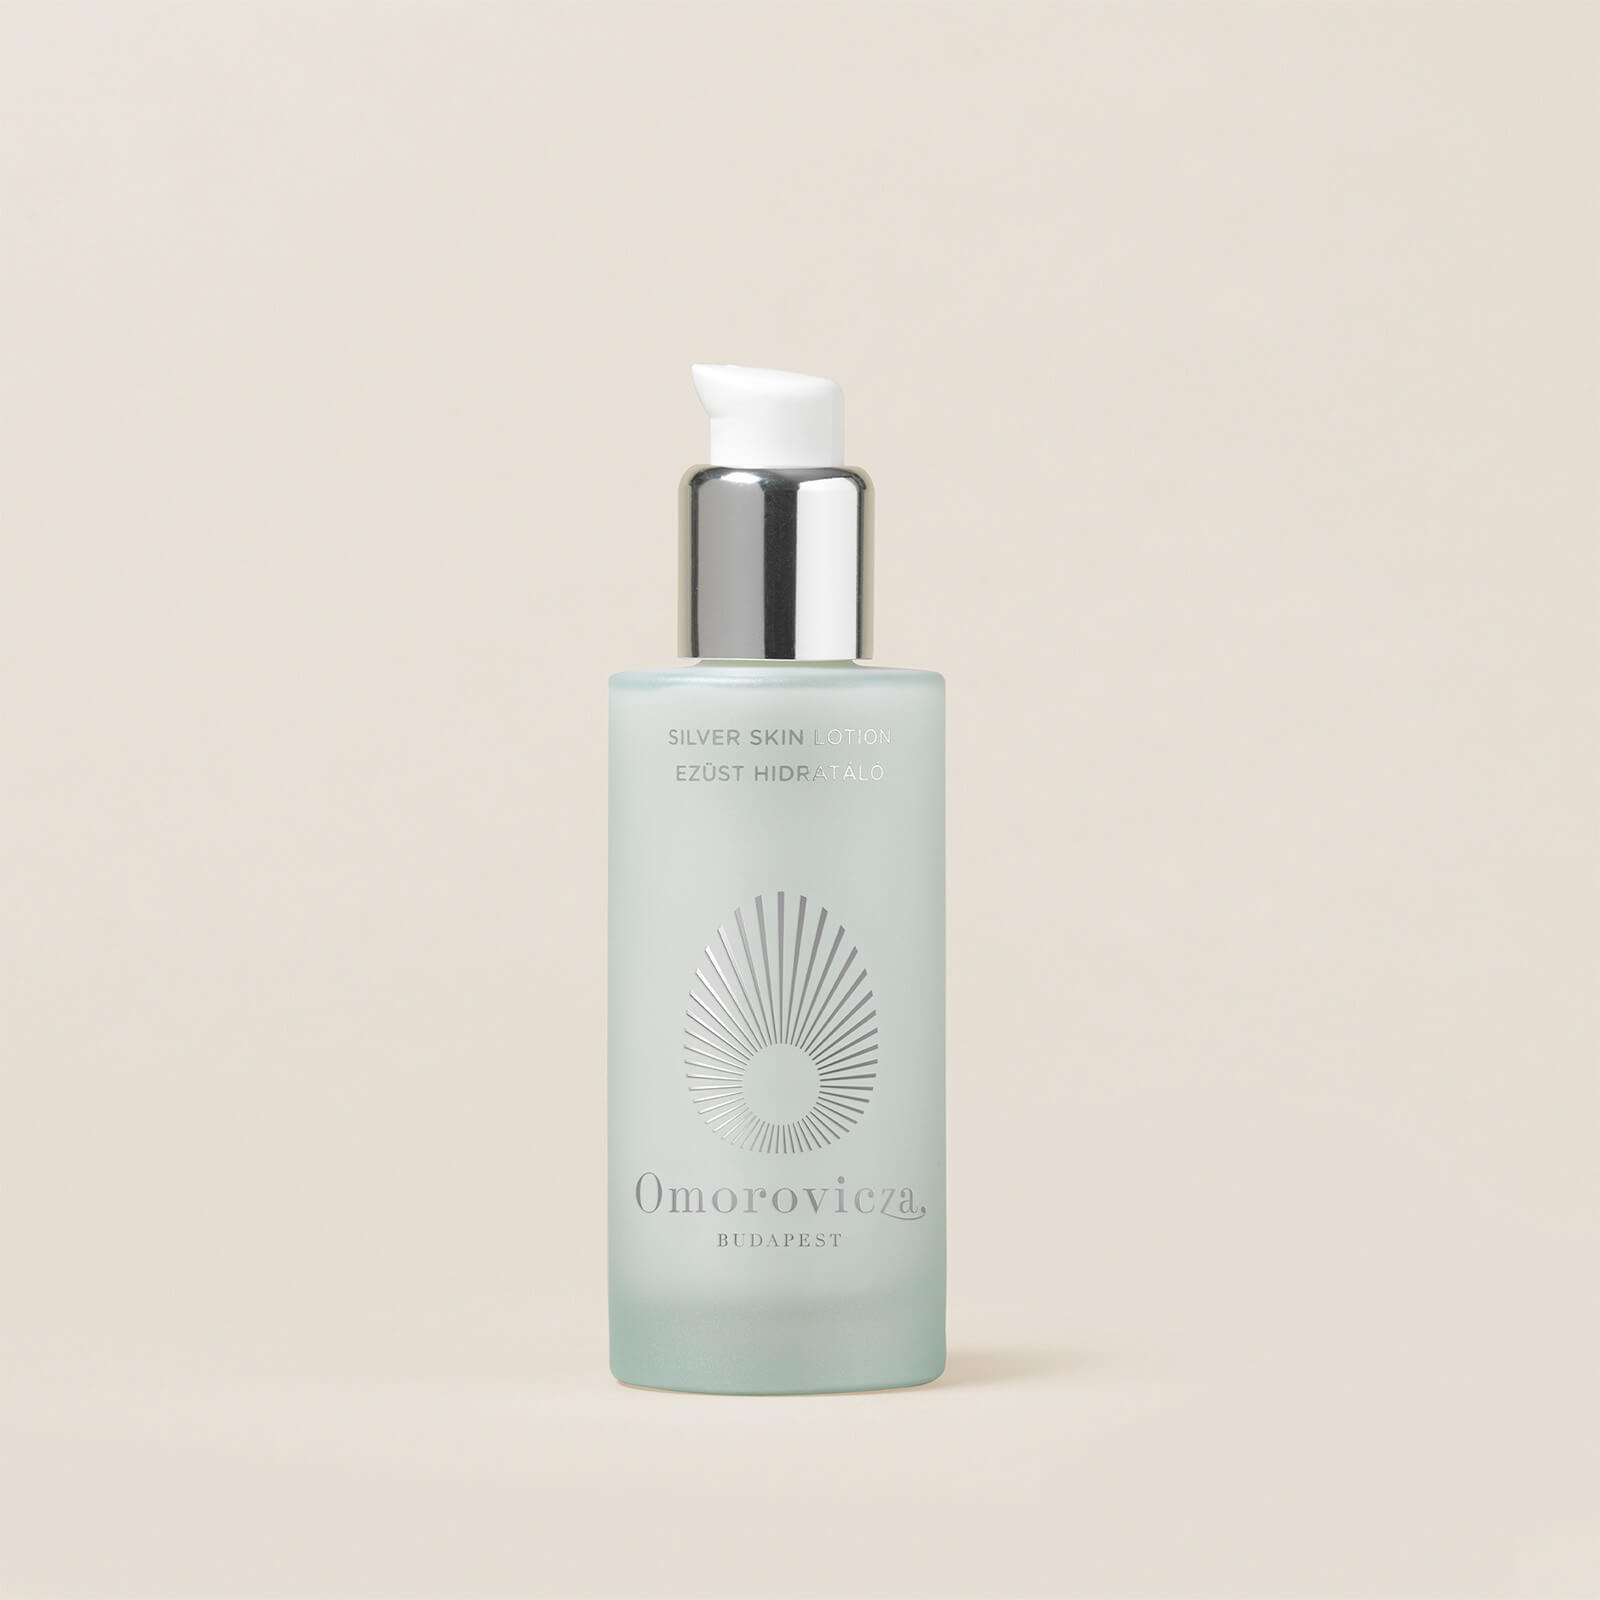 Купить Omorovicza Silver Skin Lotion 50ml